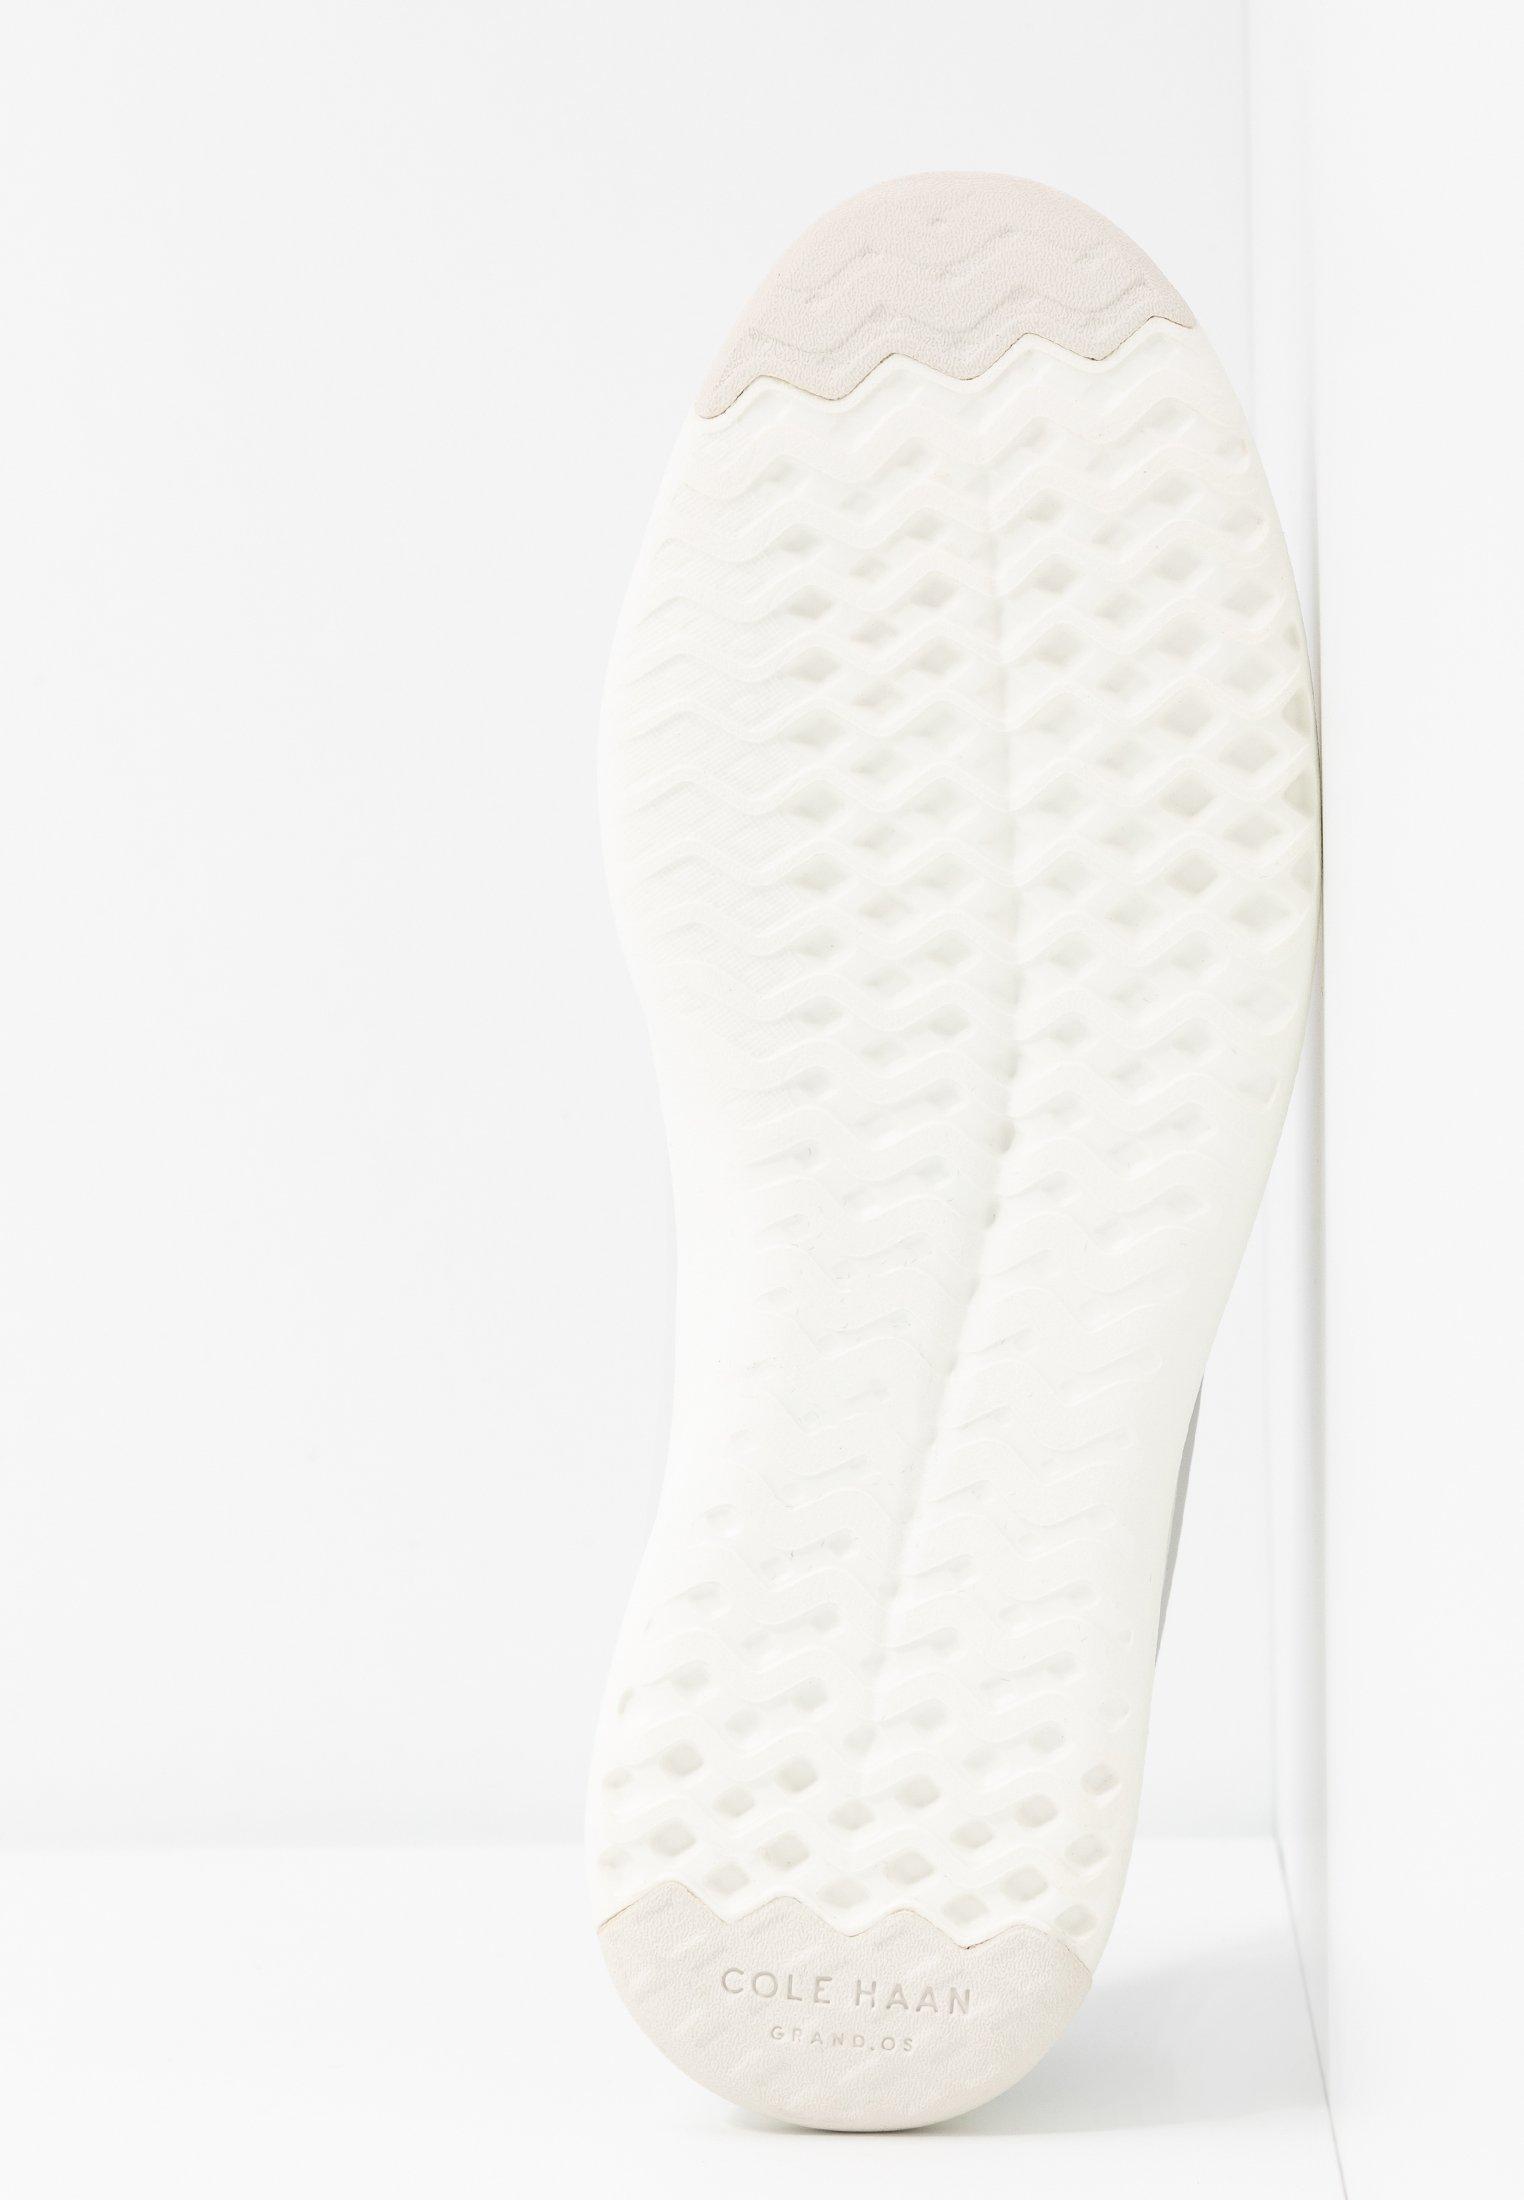 chrome Cole Cloud Nimbus optic Argento White Haan TennisSneakers Basse Grandpro v7Ygyb6f